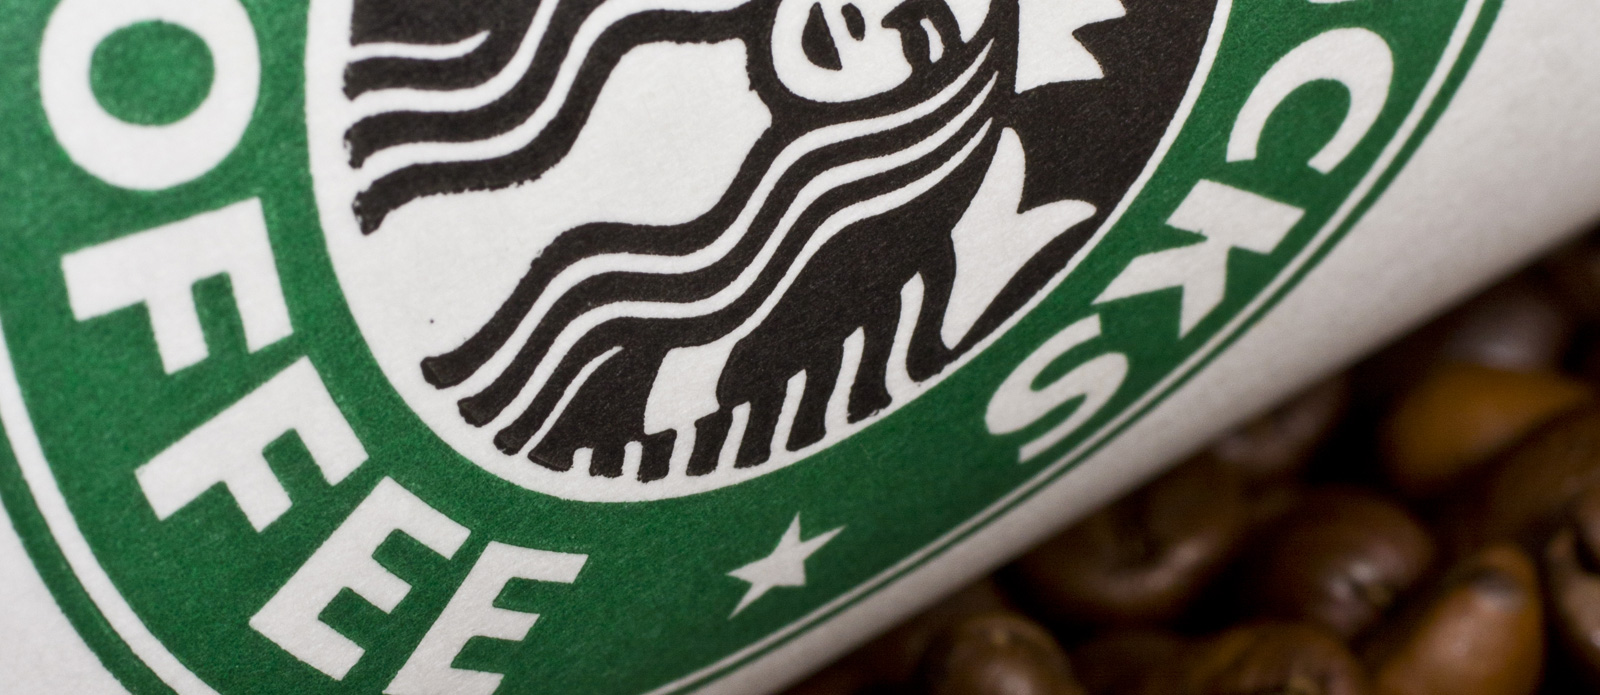 Starbucks Brand Experience